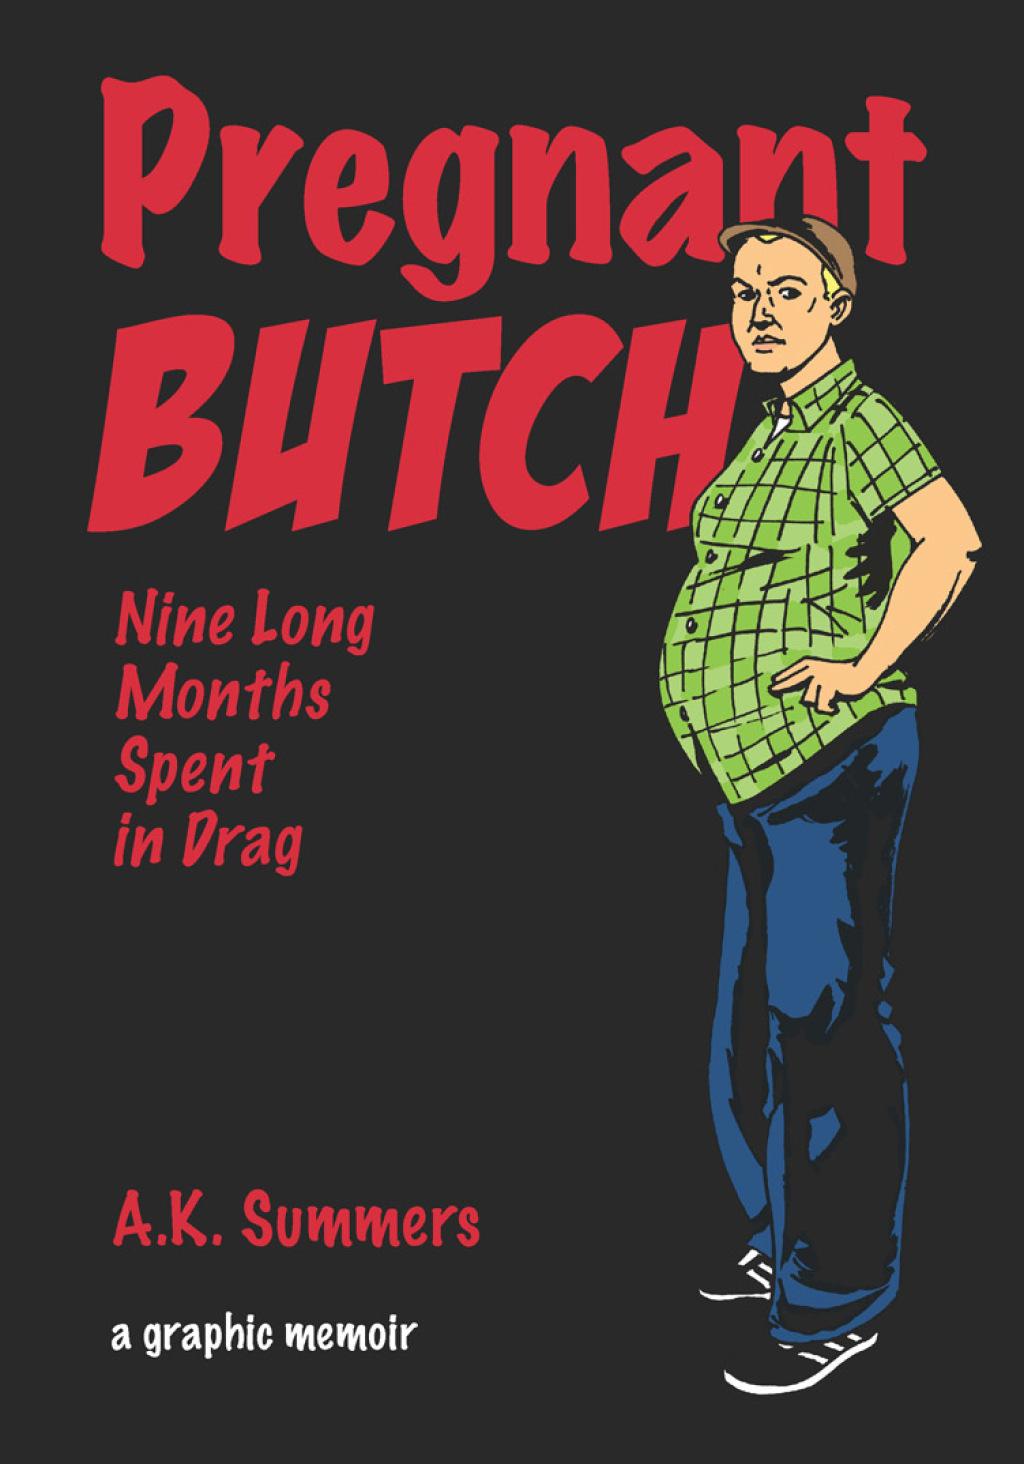 Pregnant Butch (ebook)